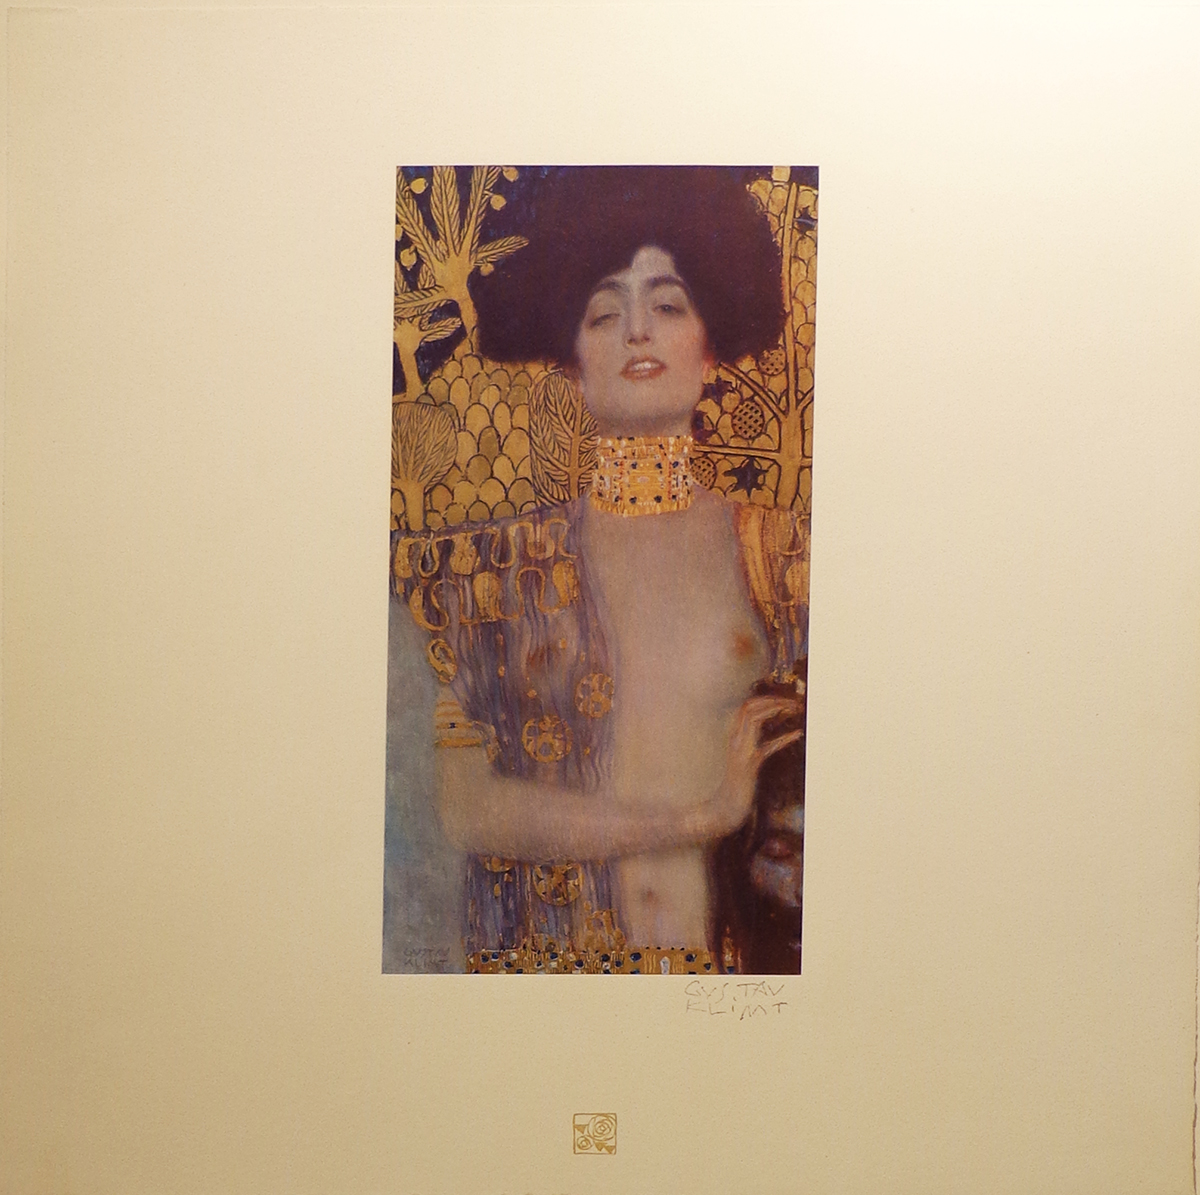 Klimt, Judith I with stamp signature